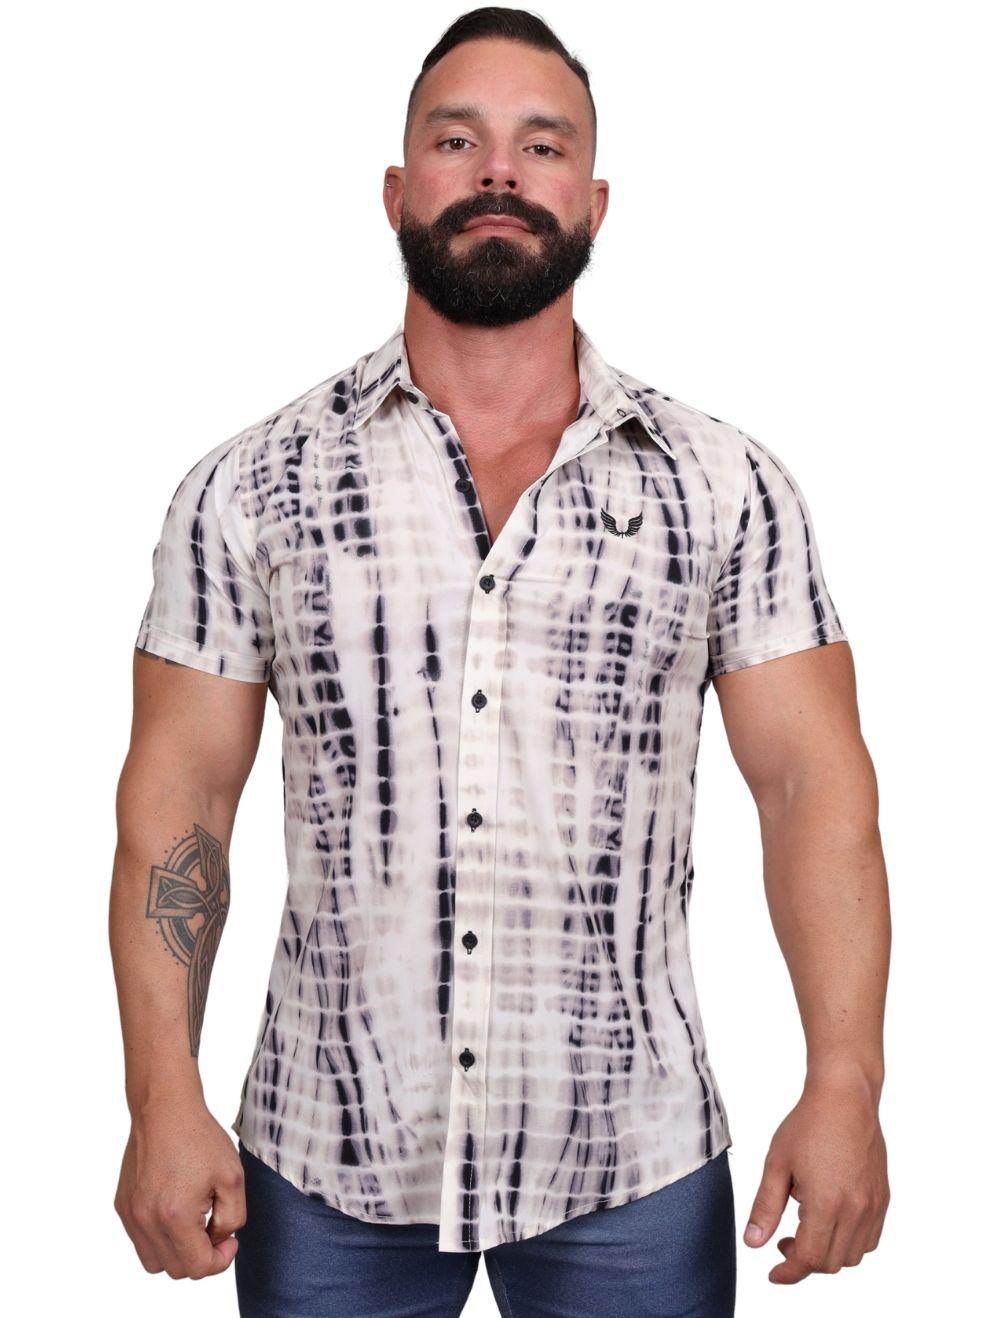 Camisa Masculina Slim Manga Curta com Elastano